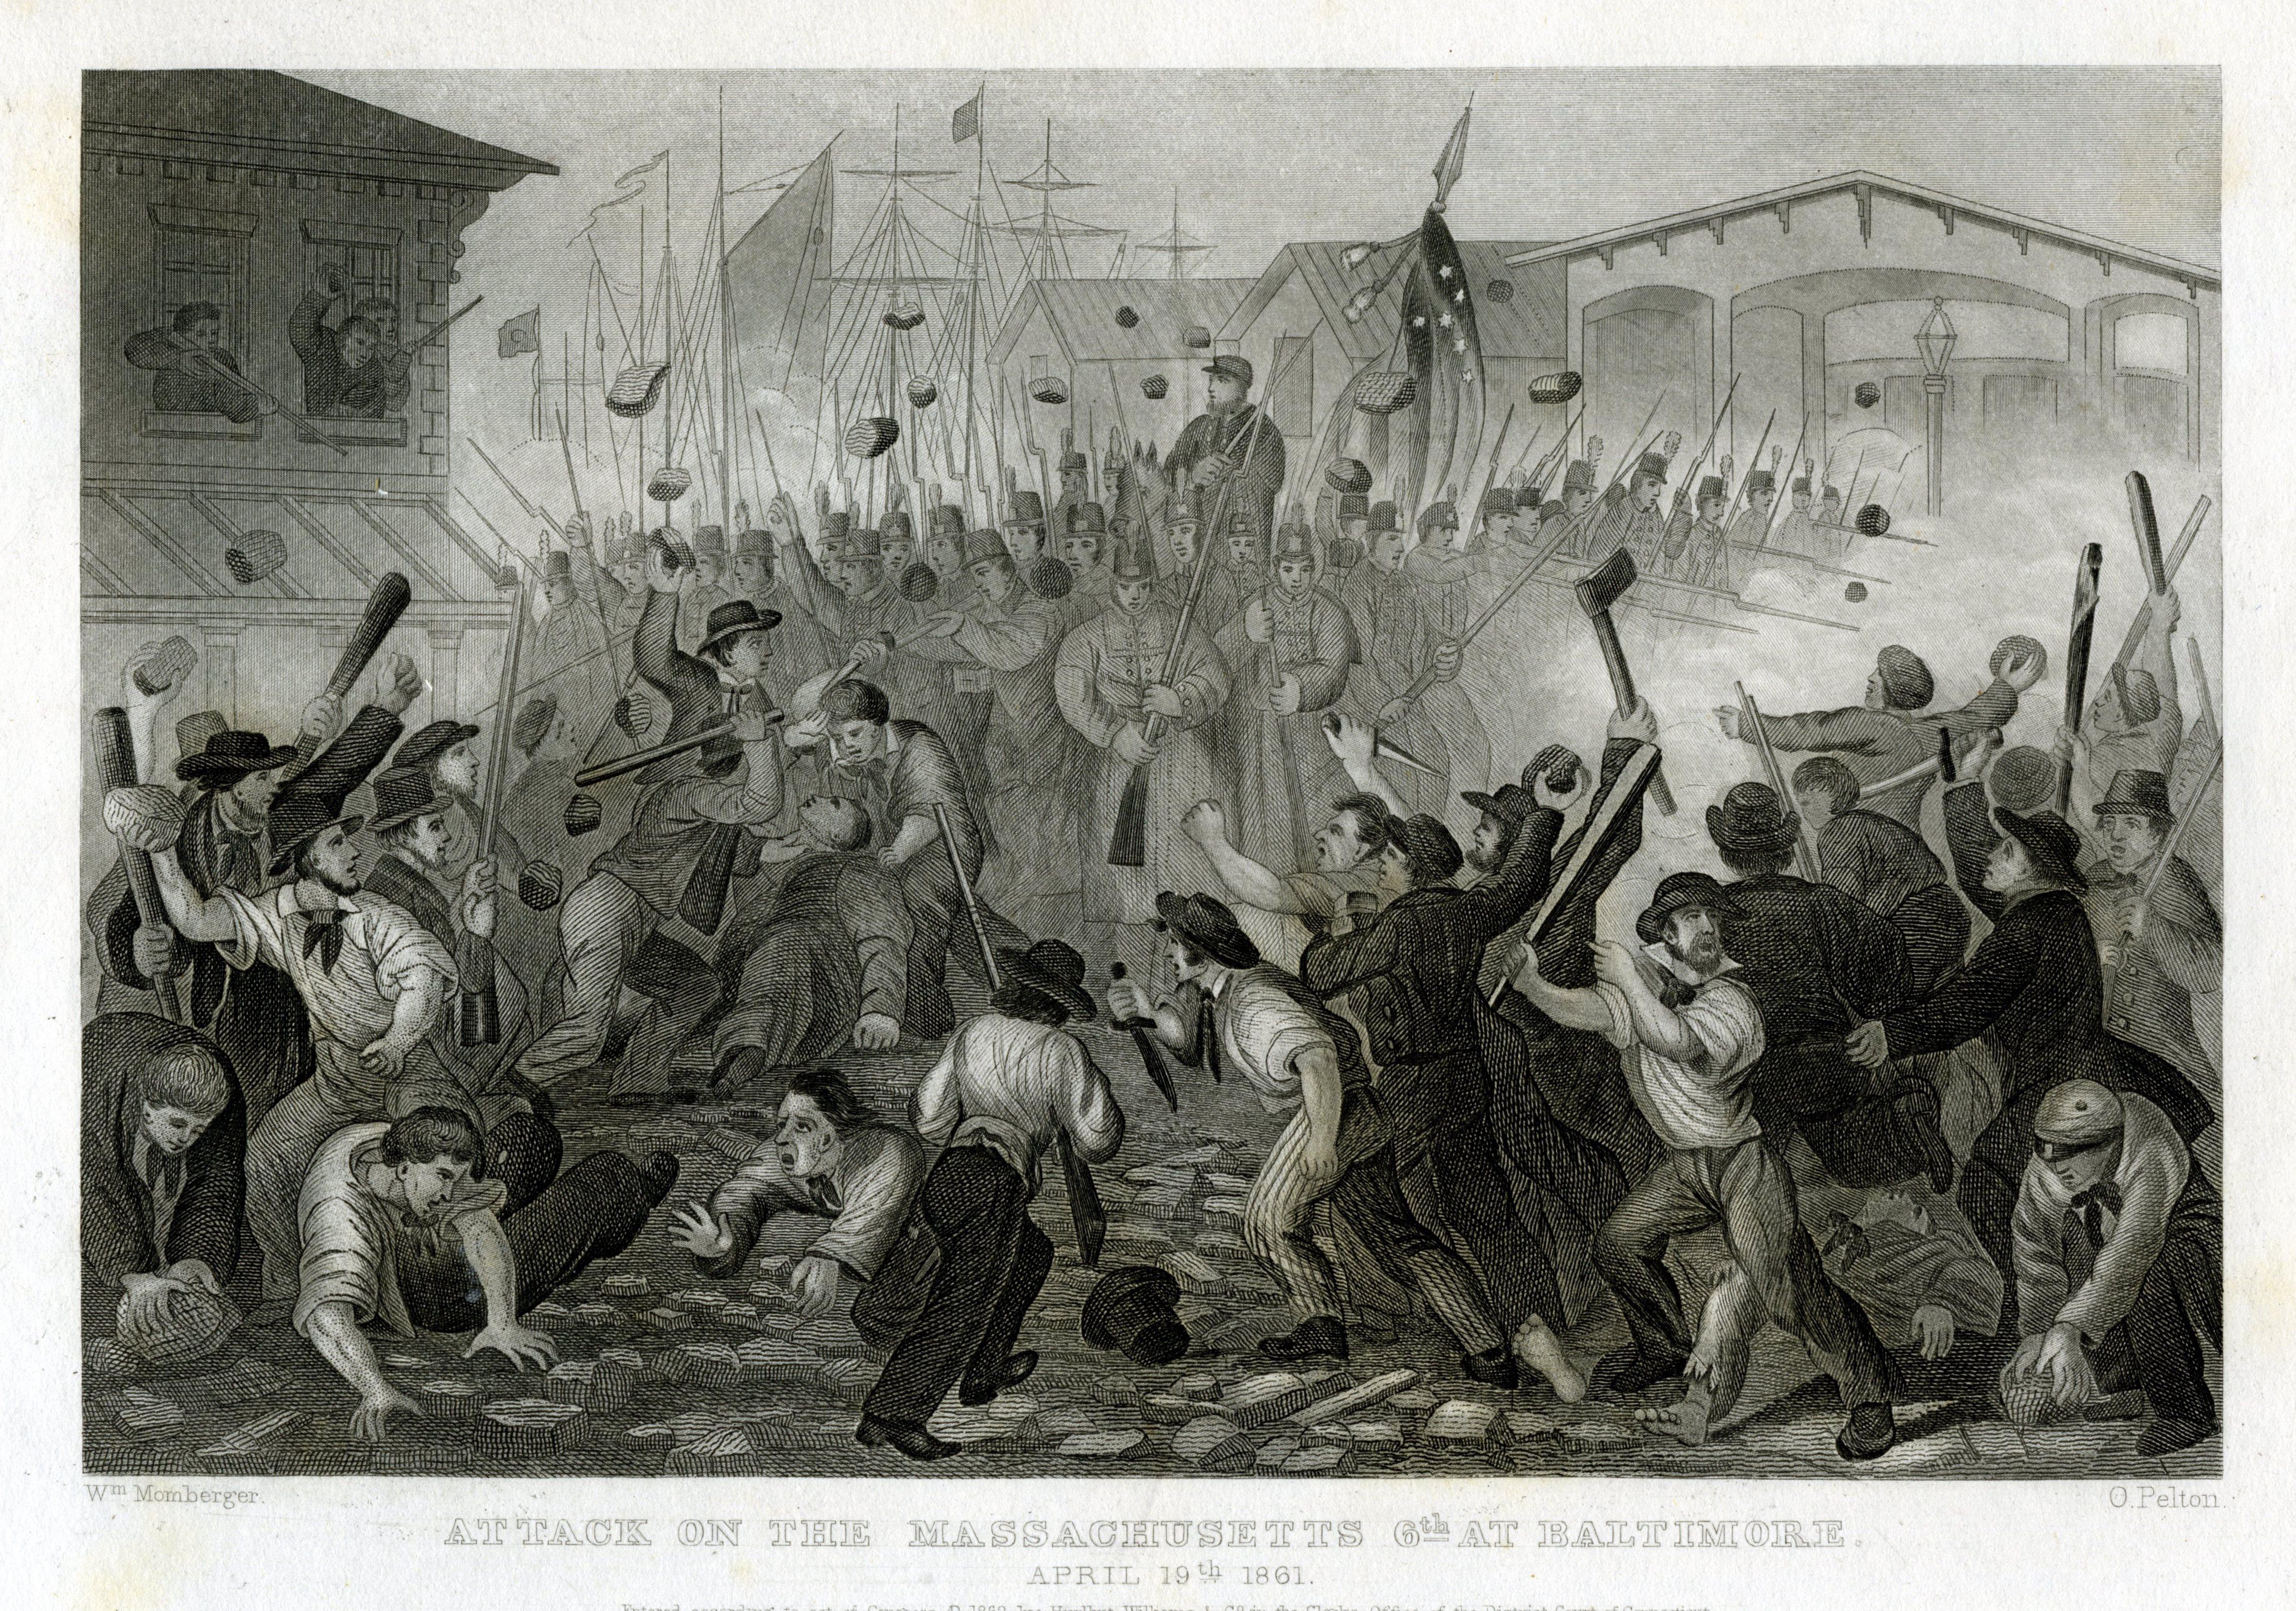 File:6th Massachusetts Militia attacked in Baltimore 1861.jpg